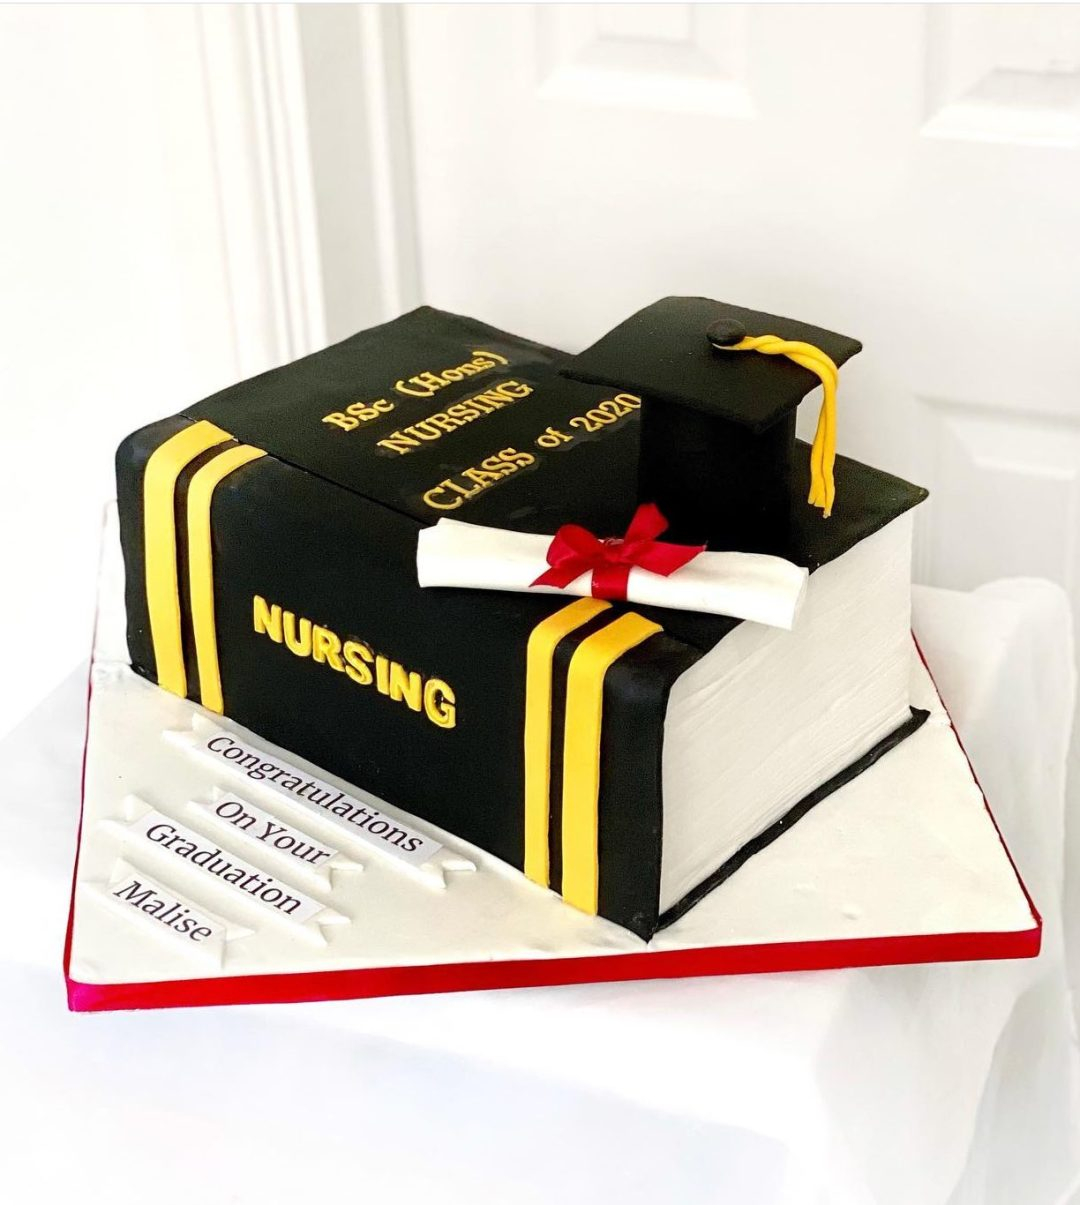 Nursing graduation cake